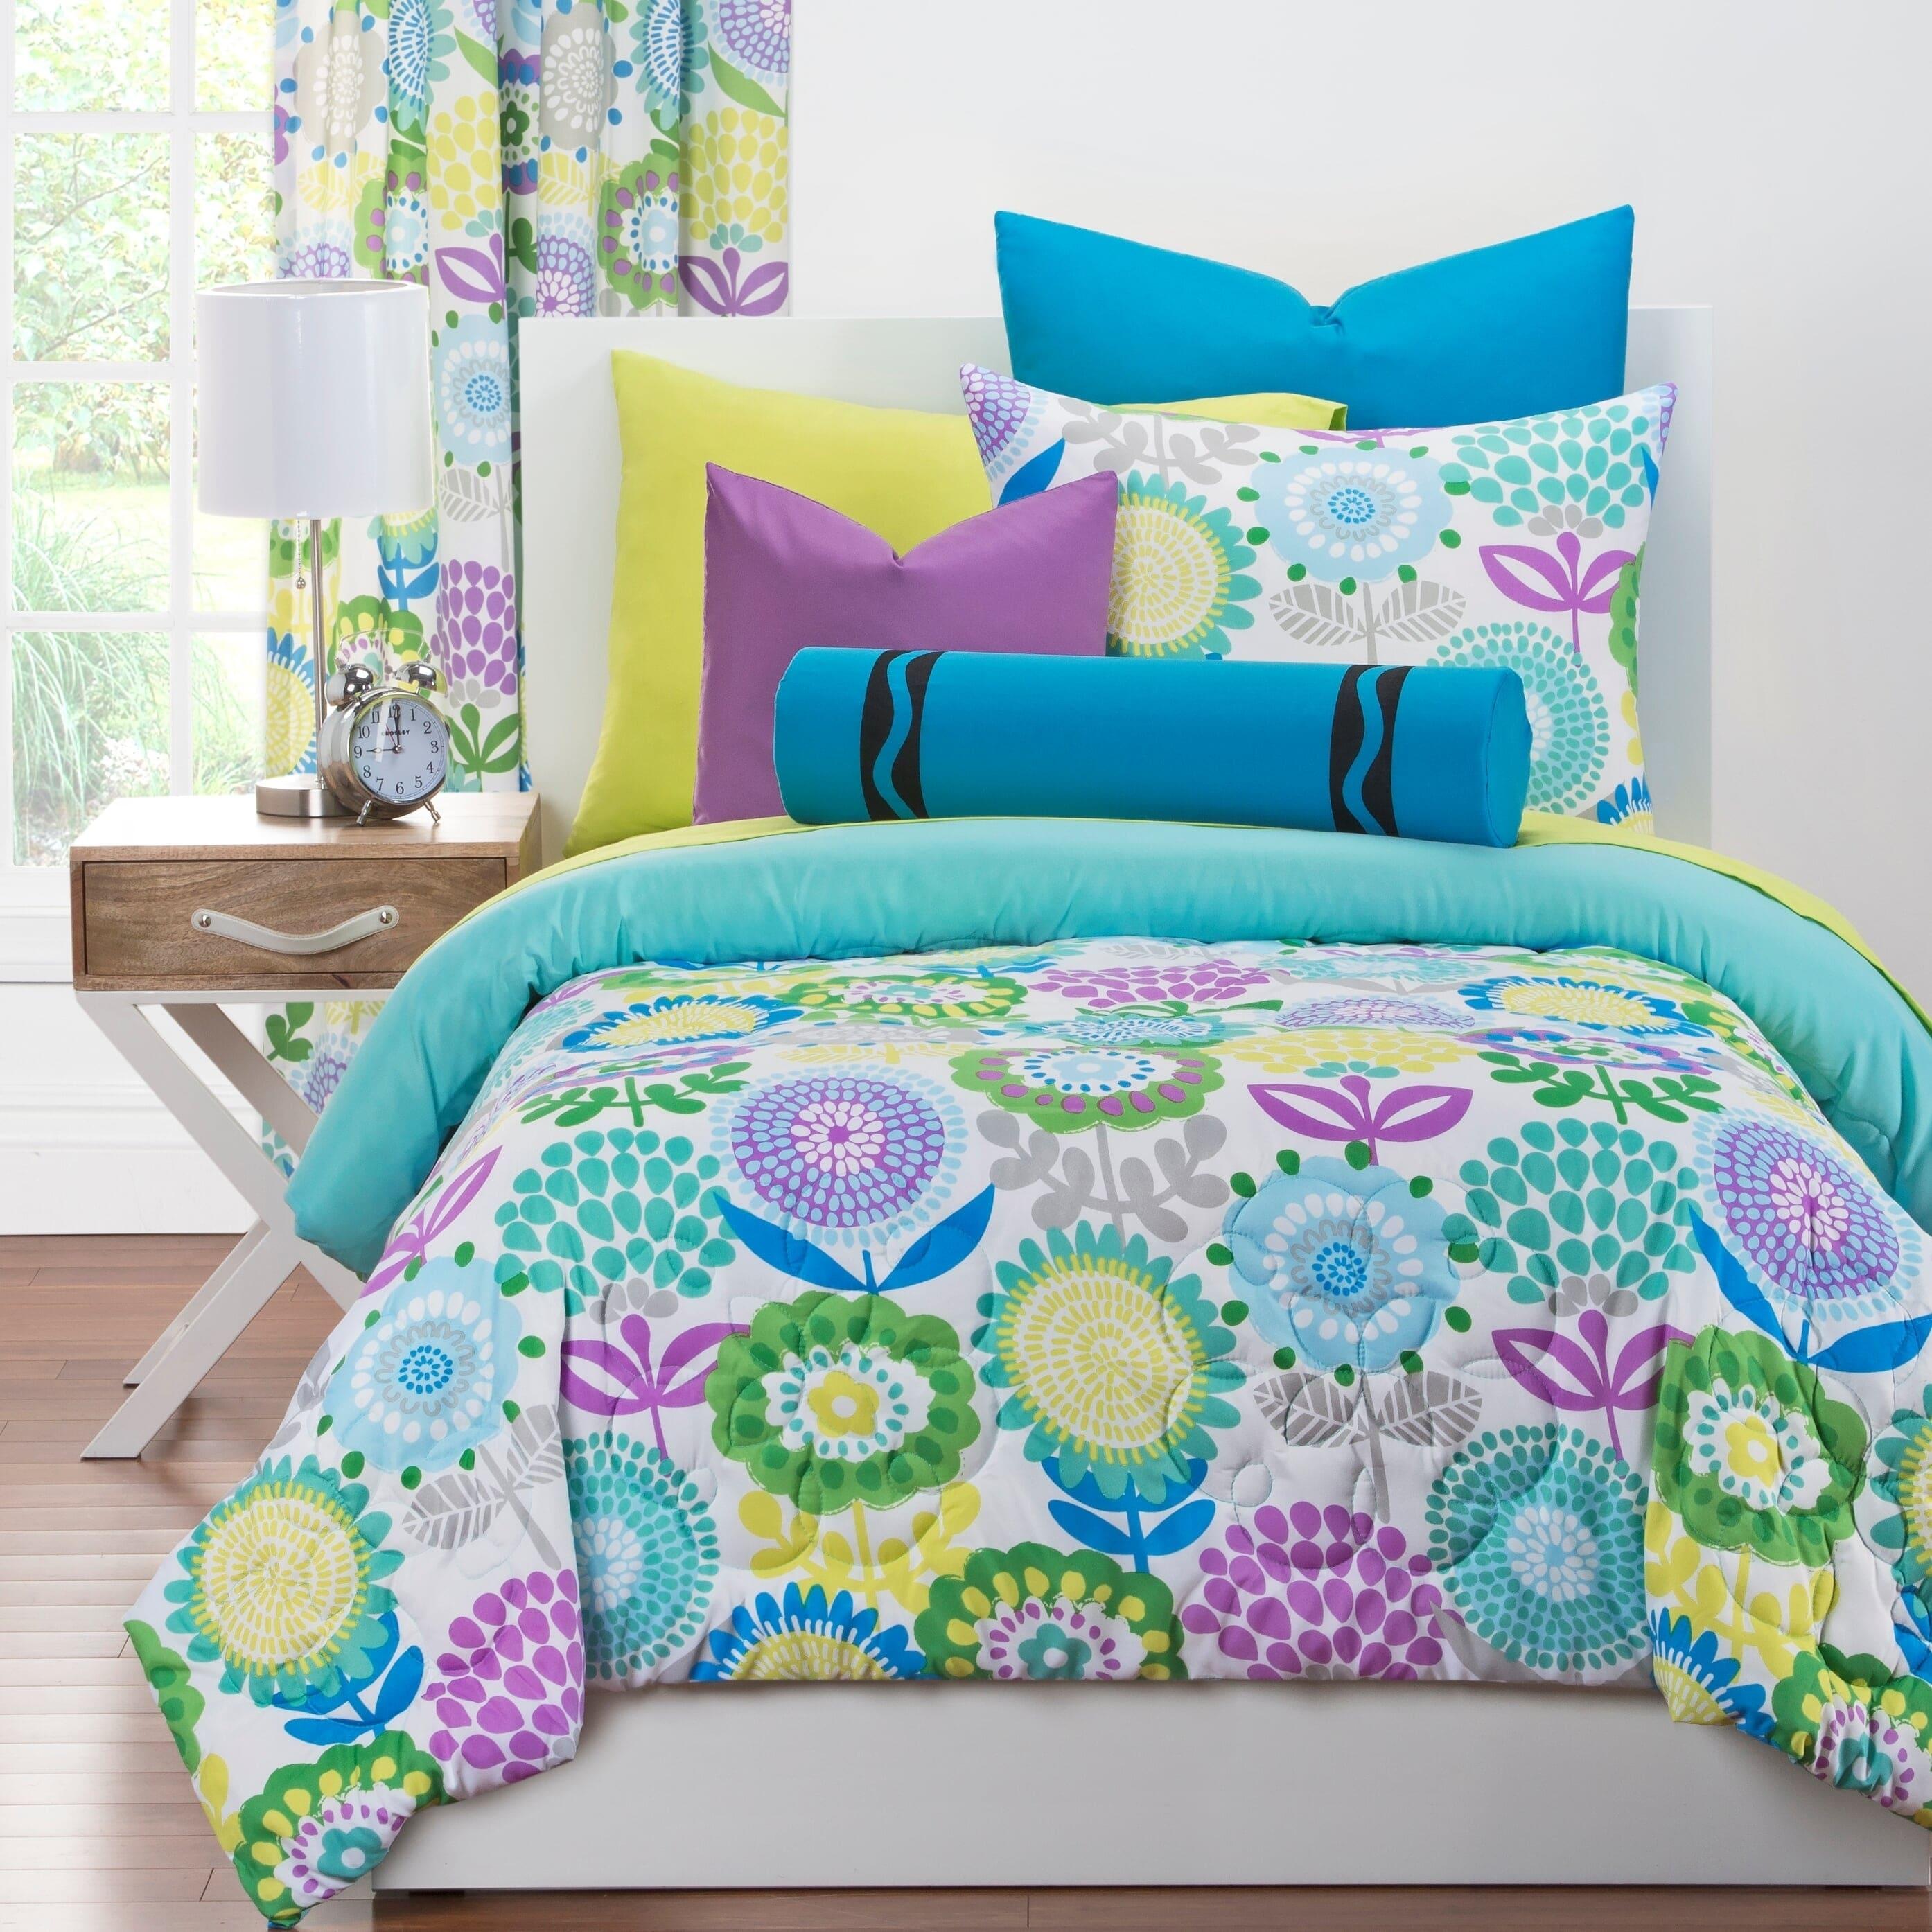 Crayola Pointillist Pansy 3 Piece Comforter Set Overstock 10302171 Twin